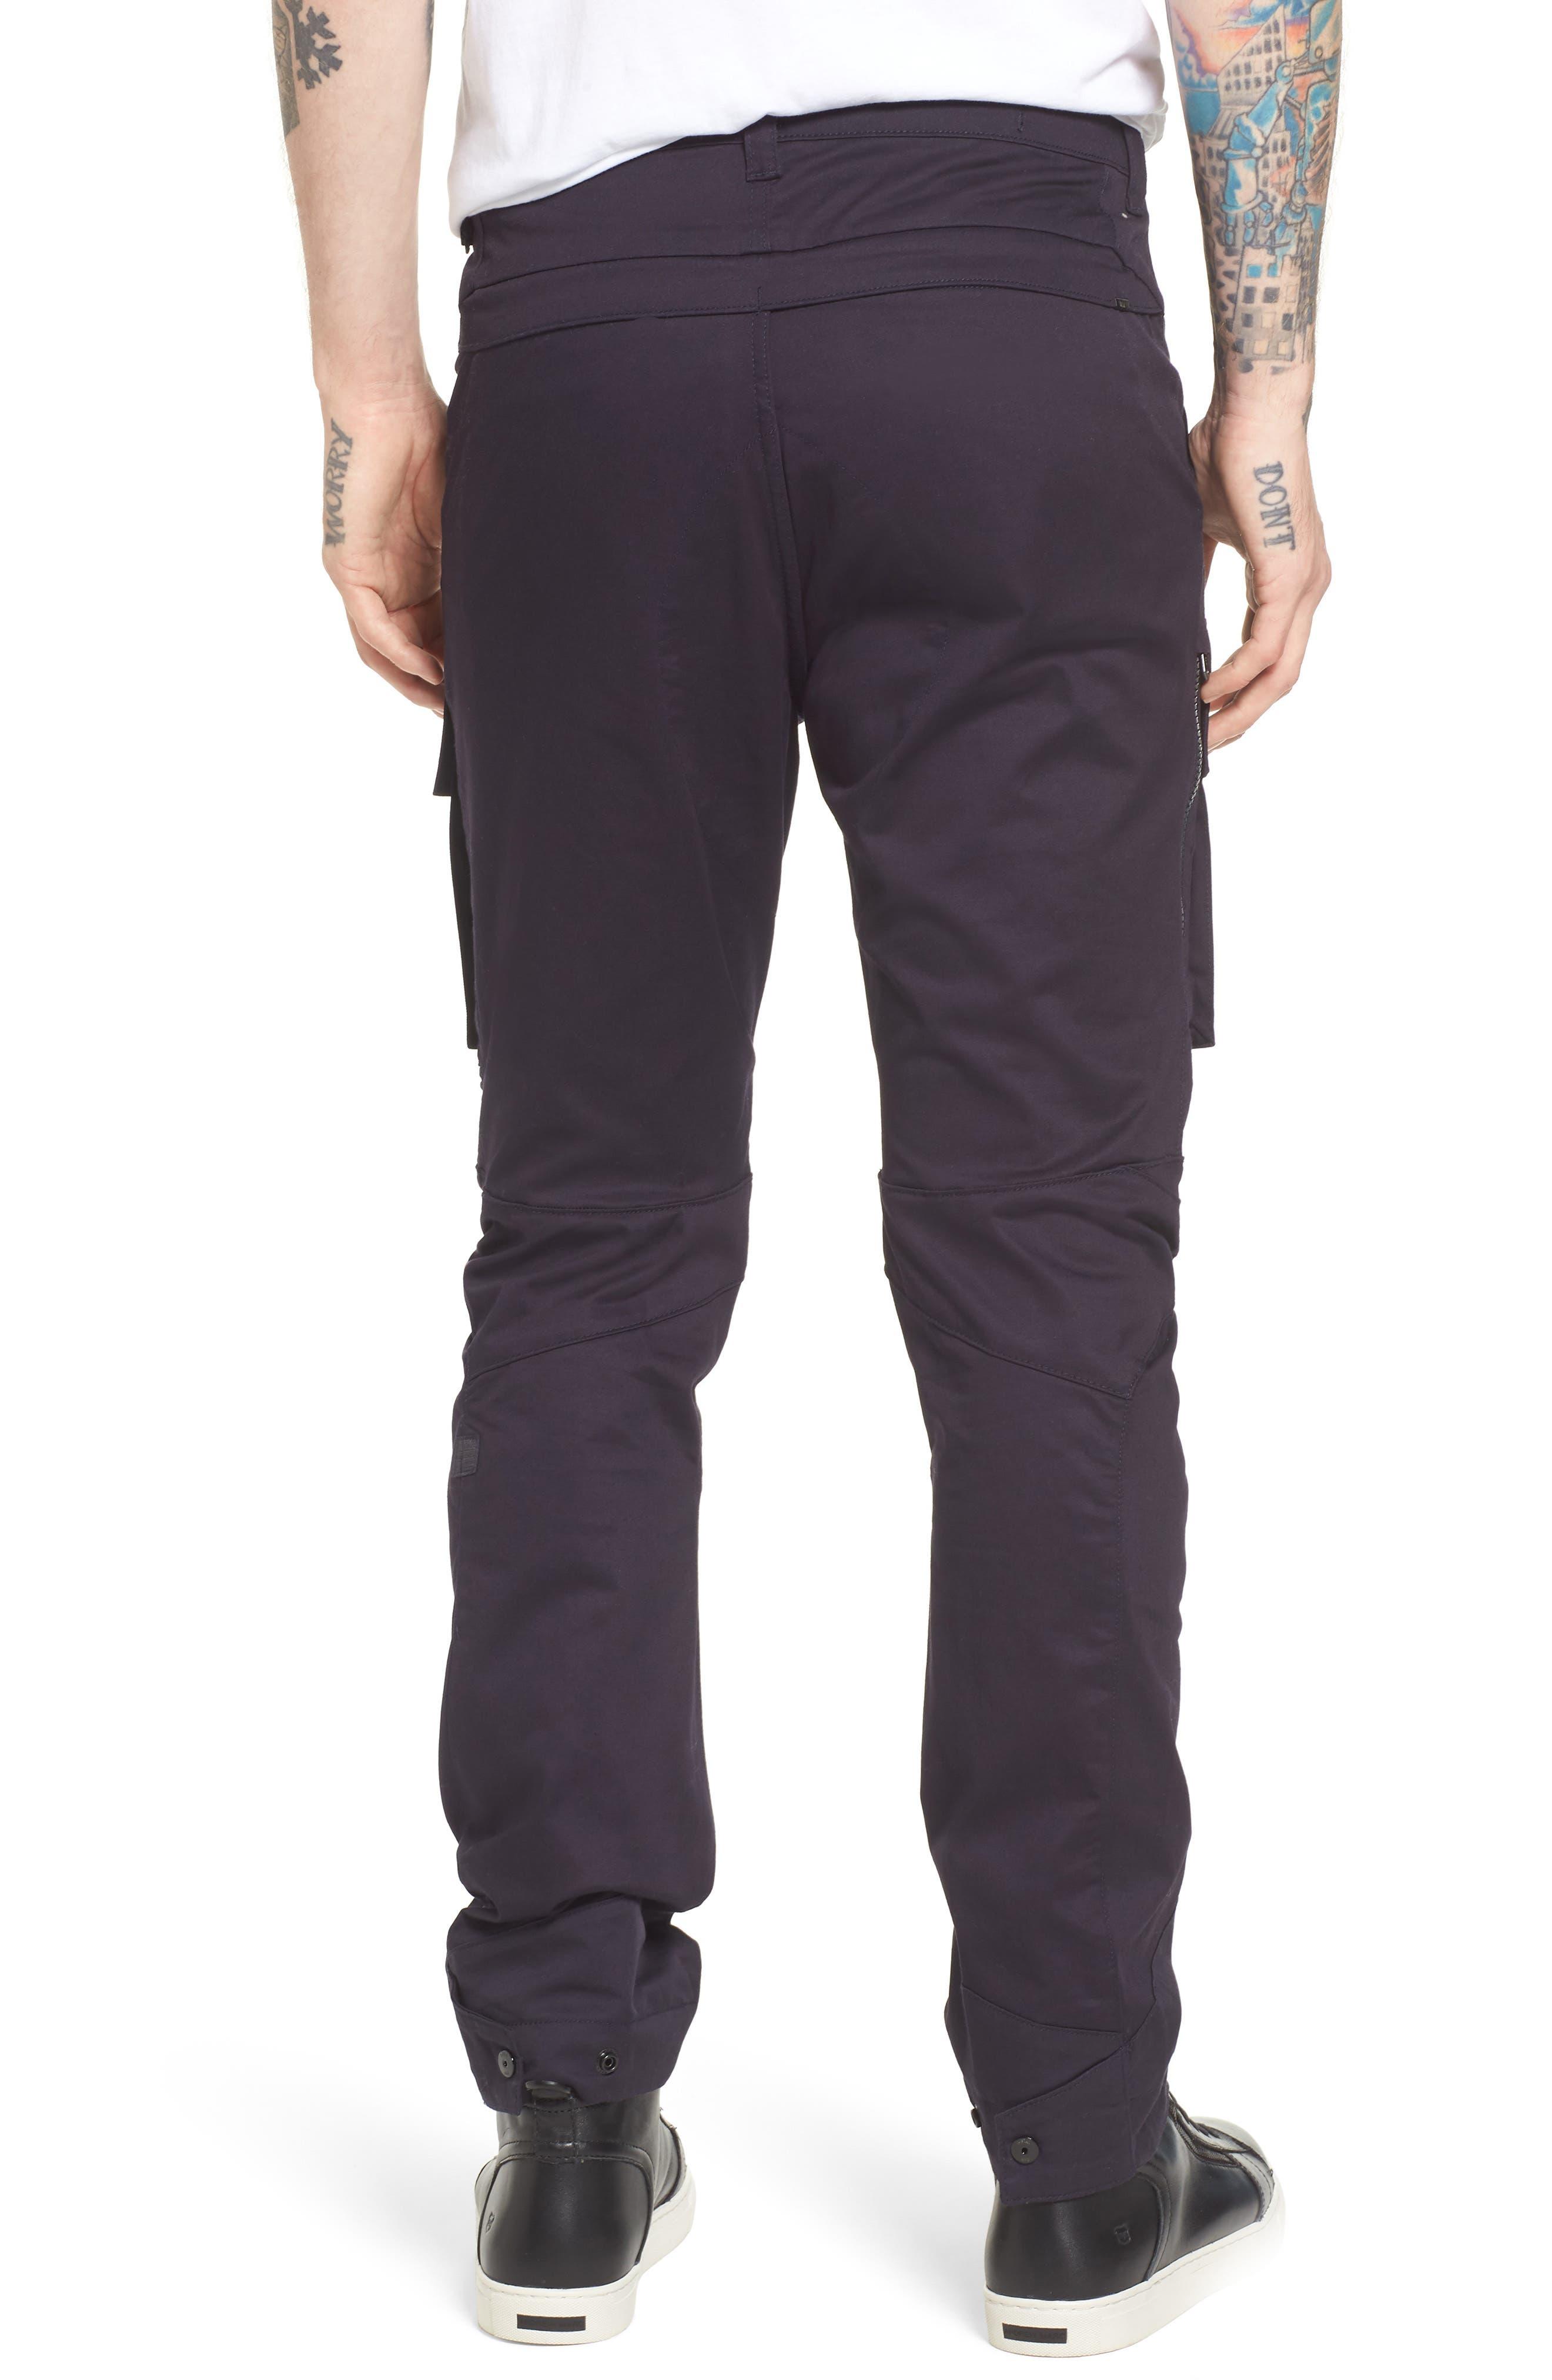 Vodan DC Slim Pants,                             Alternate thumbnail 2, color,                             Dark Naval Blue